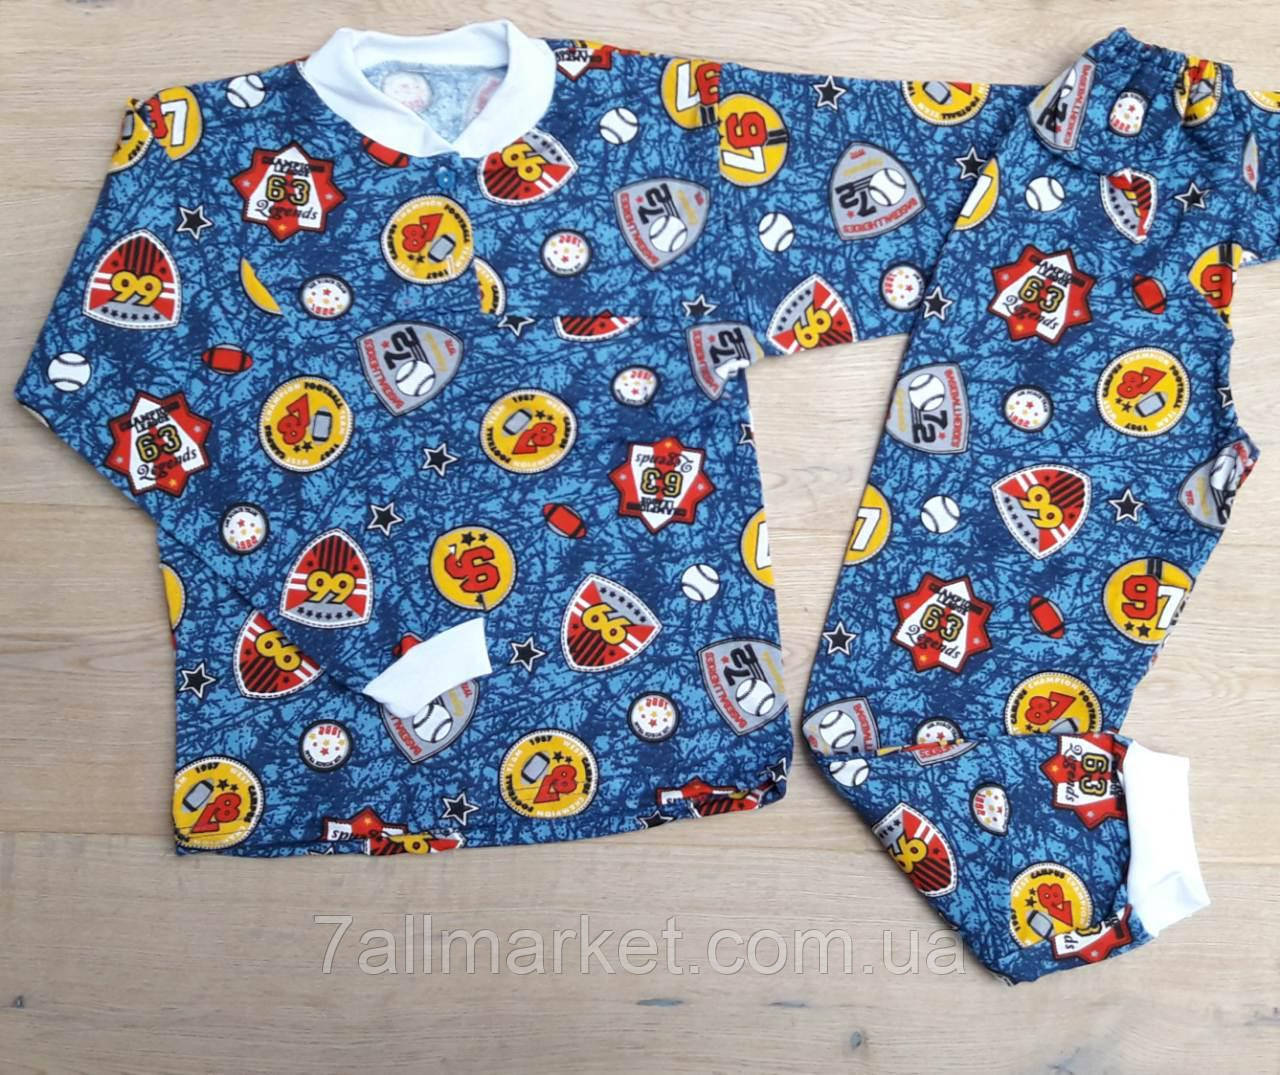 759506e65354 Пижама детская на байке на мальчика размеры 36-40